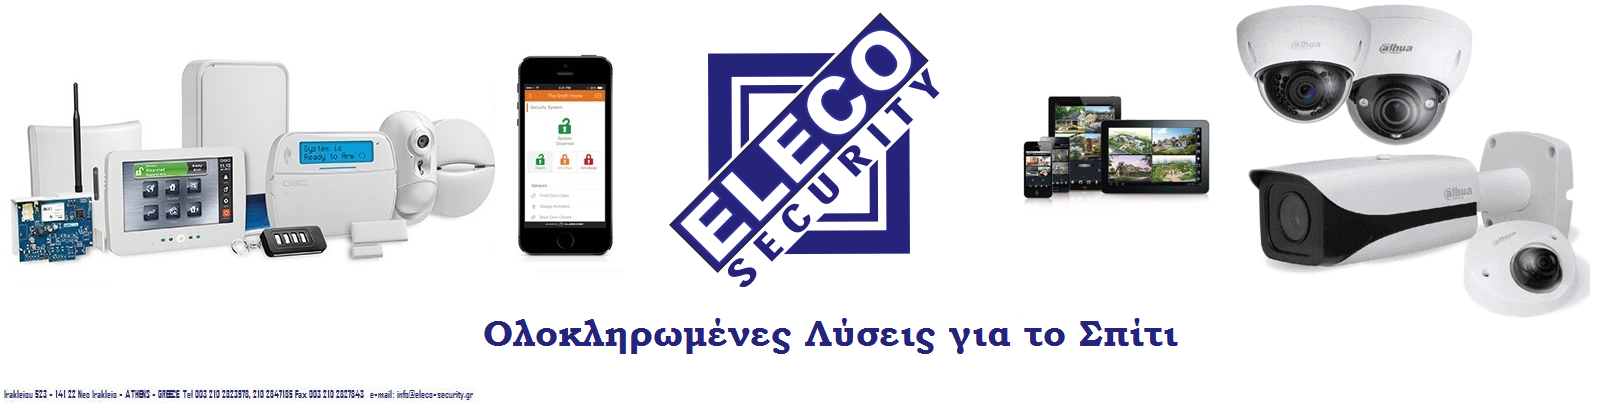 Eleco Security - Συστήματα ασφαλείας - Συναγερμοί - Πυρανιχνεύσεις Νέο Ηράκλειο, Βόρεια Προάστια. Κάμερες ασφαλείας - Επισκευές γραμμών τηλεφωνίας Βόρεια Προάστια